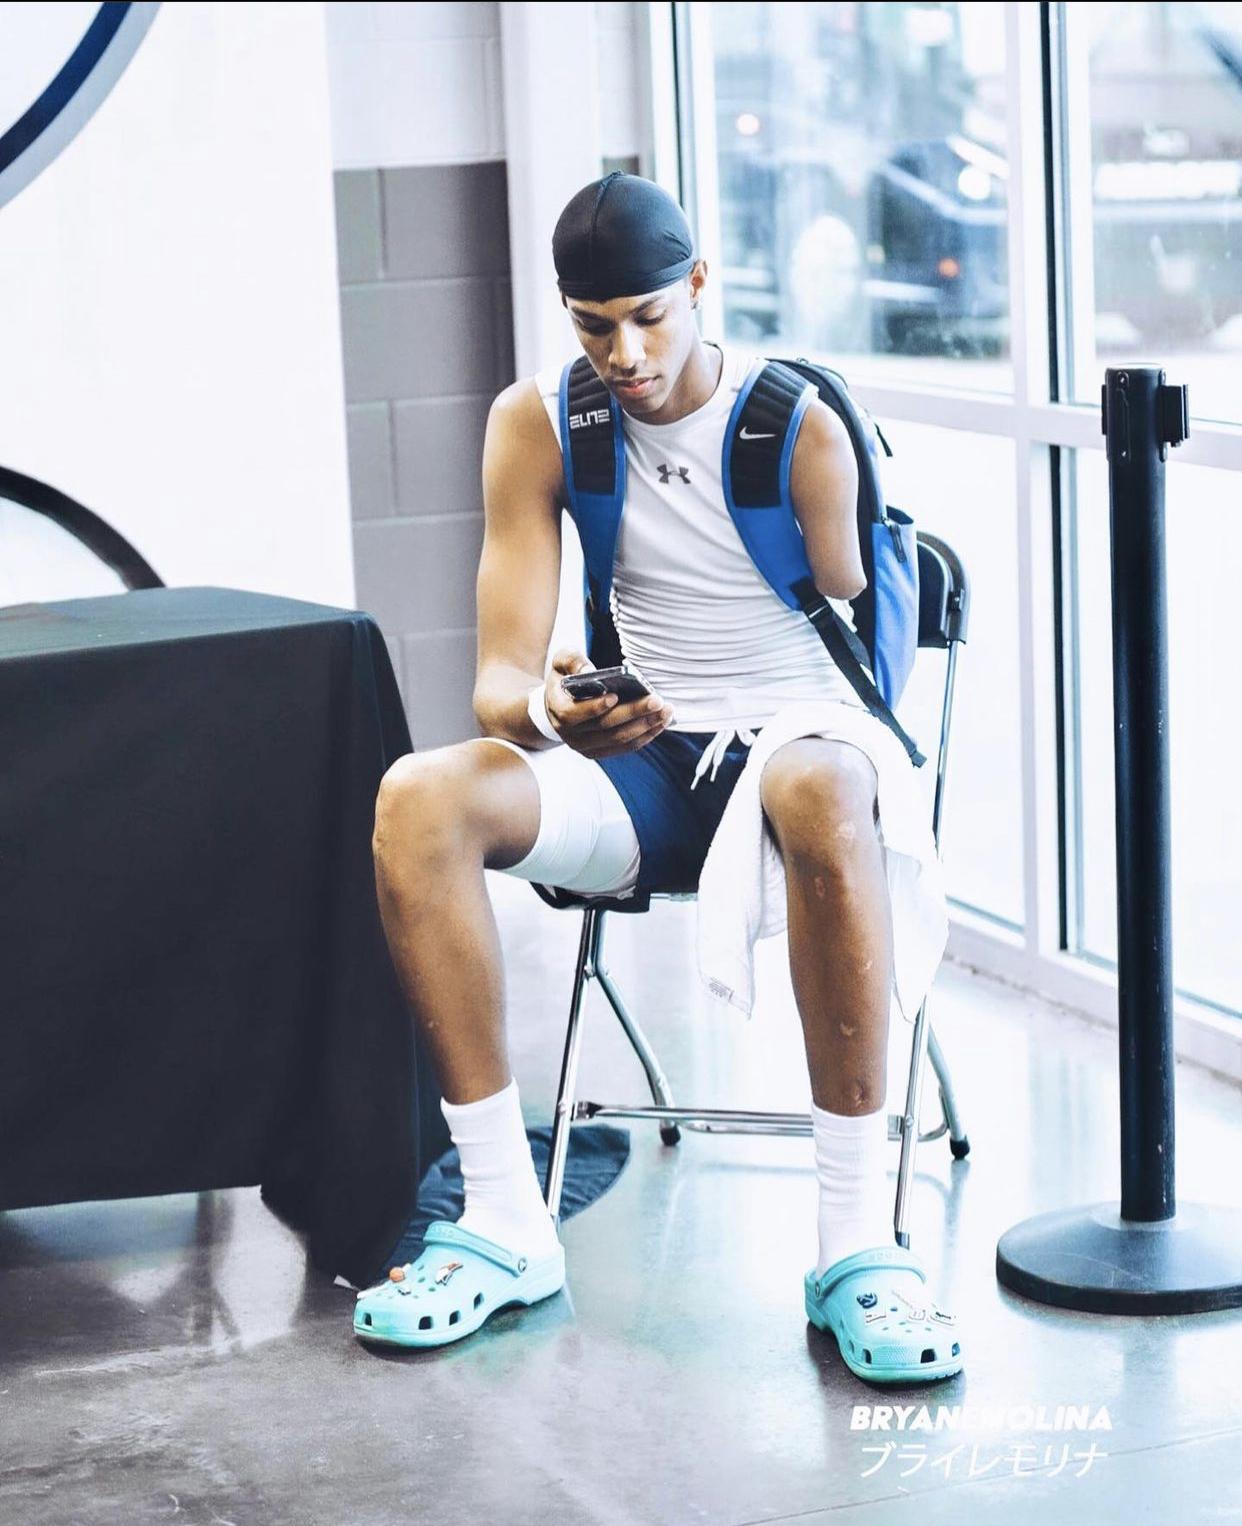 One-Armed Dominican Republic Basketball Player, Hansel Donato Domínguez Receives a Scholarship